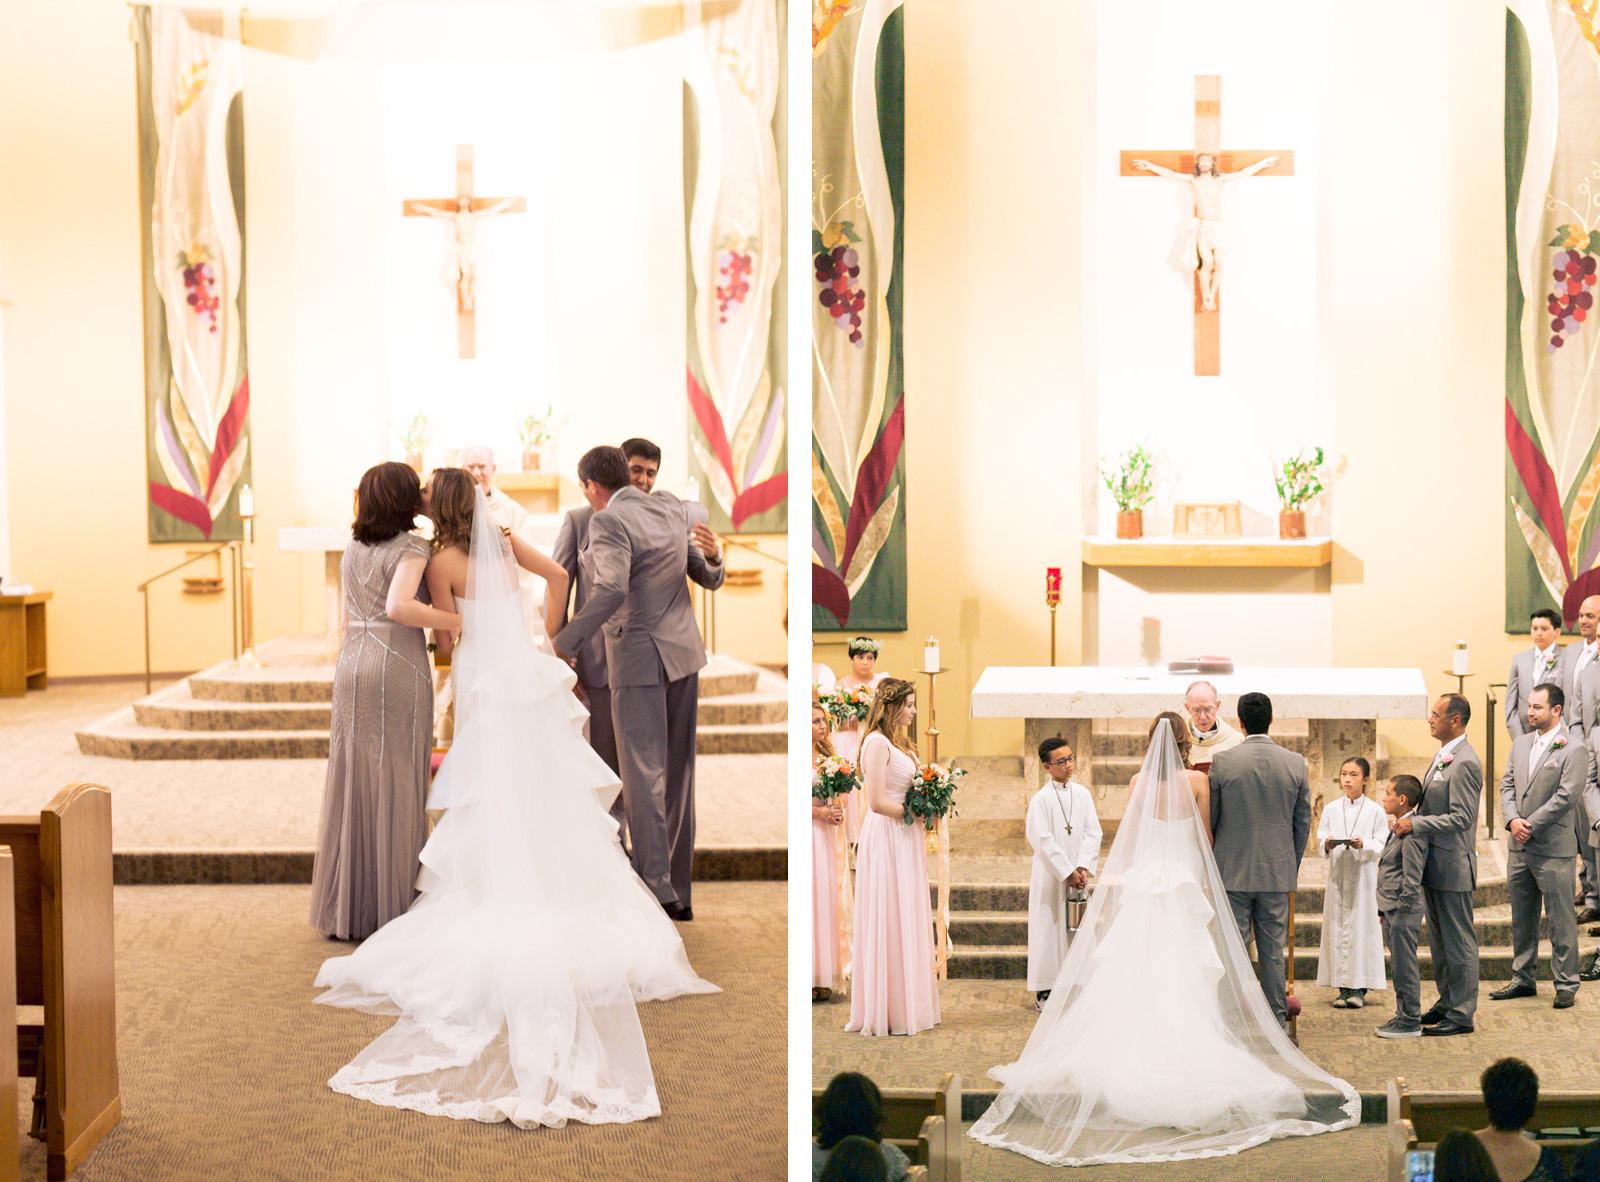 Wedding-Ceremony_02.jpg